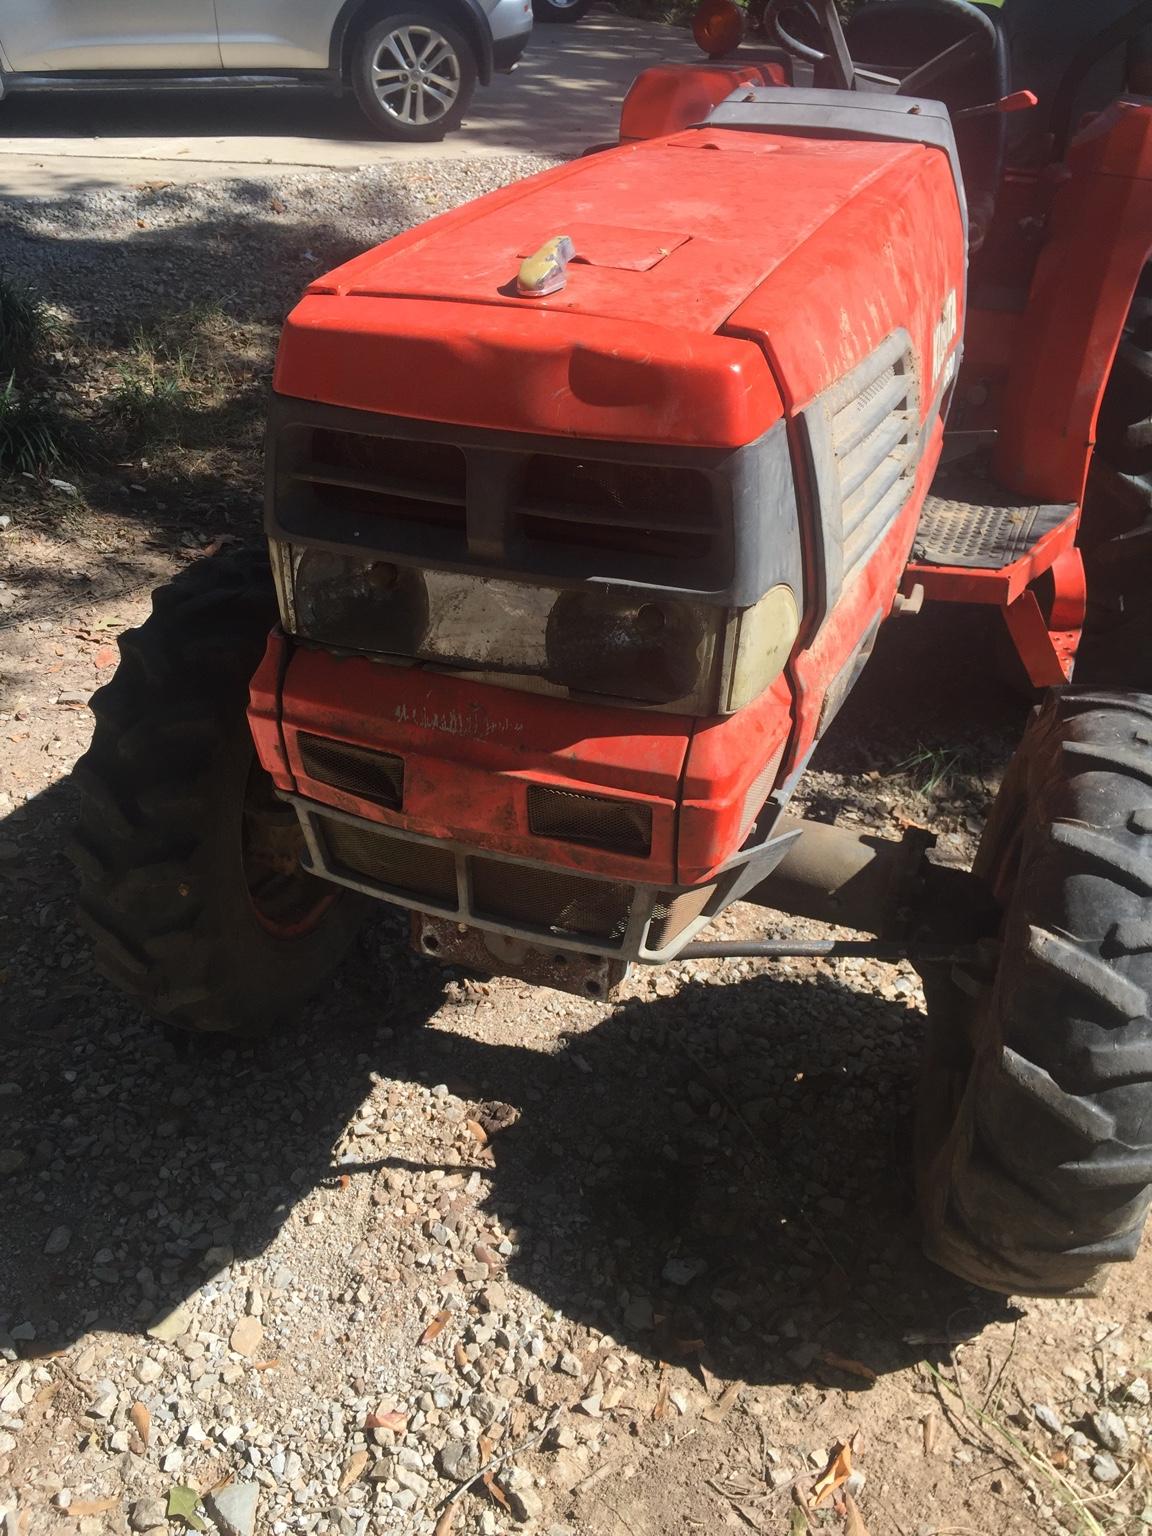 Kubota Tractor Led Lights : Led replacements for damaged lights orangetractortalks